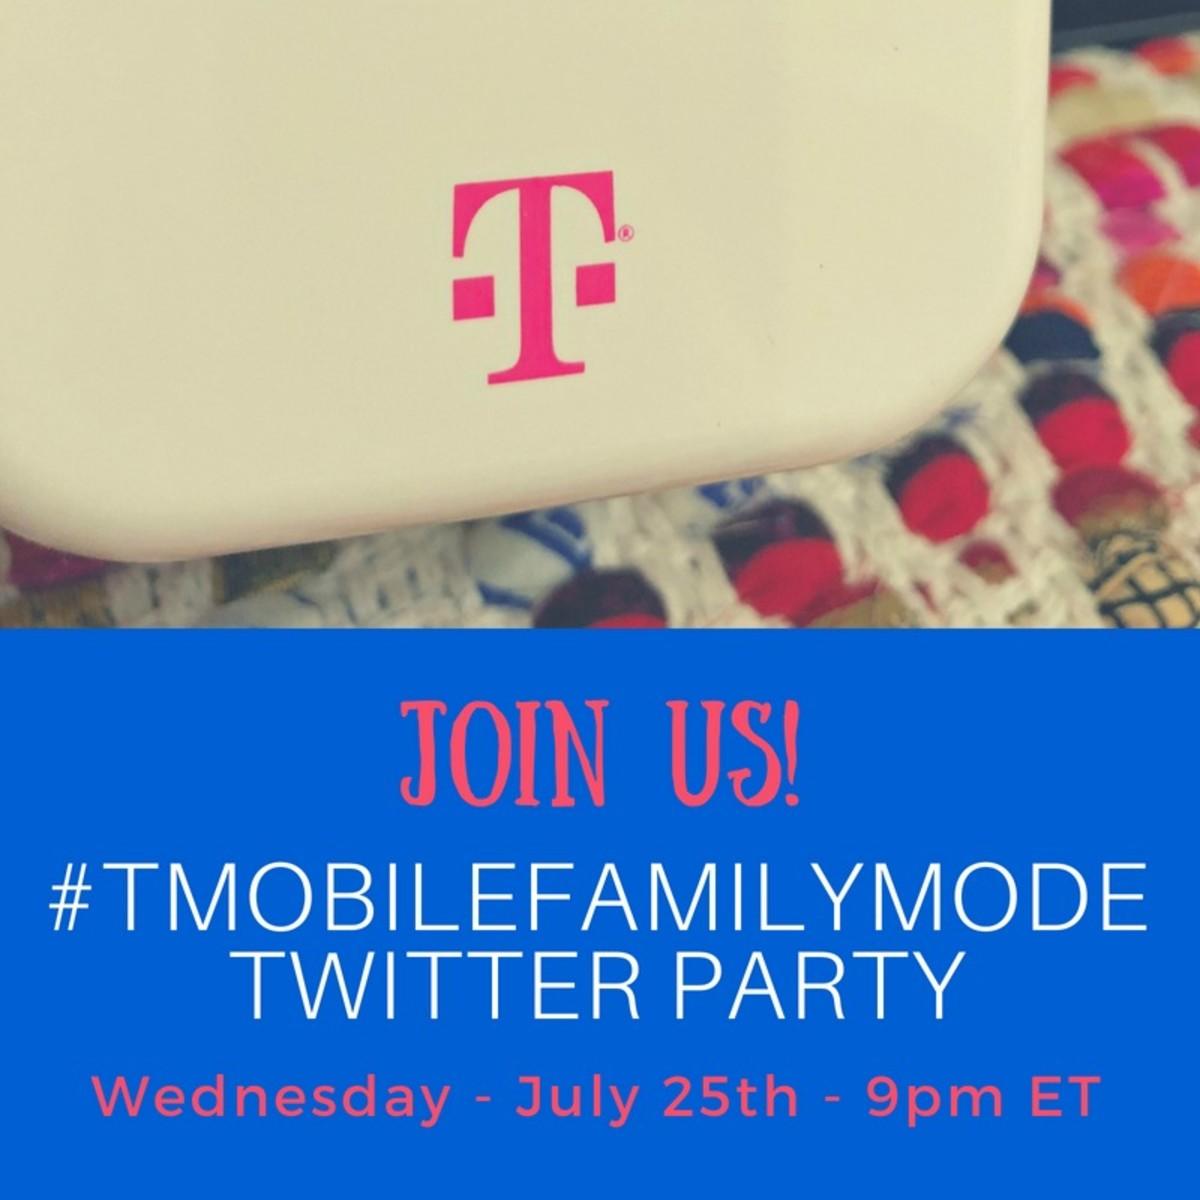 #TMobileFamilyMode Twitter party